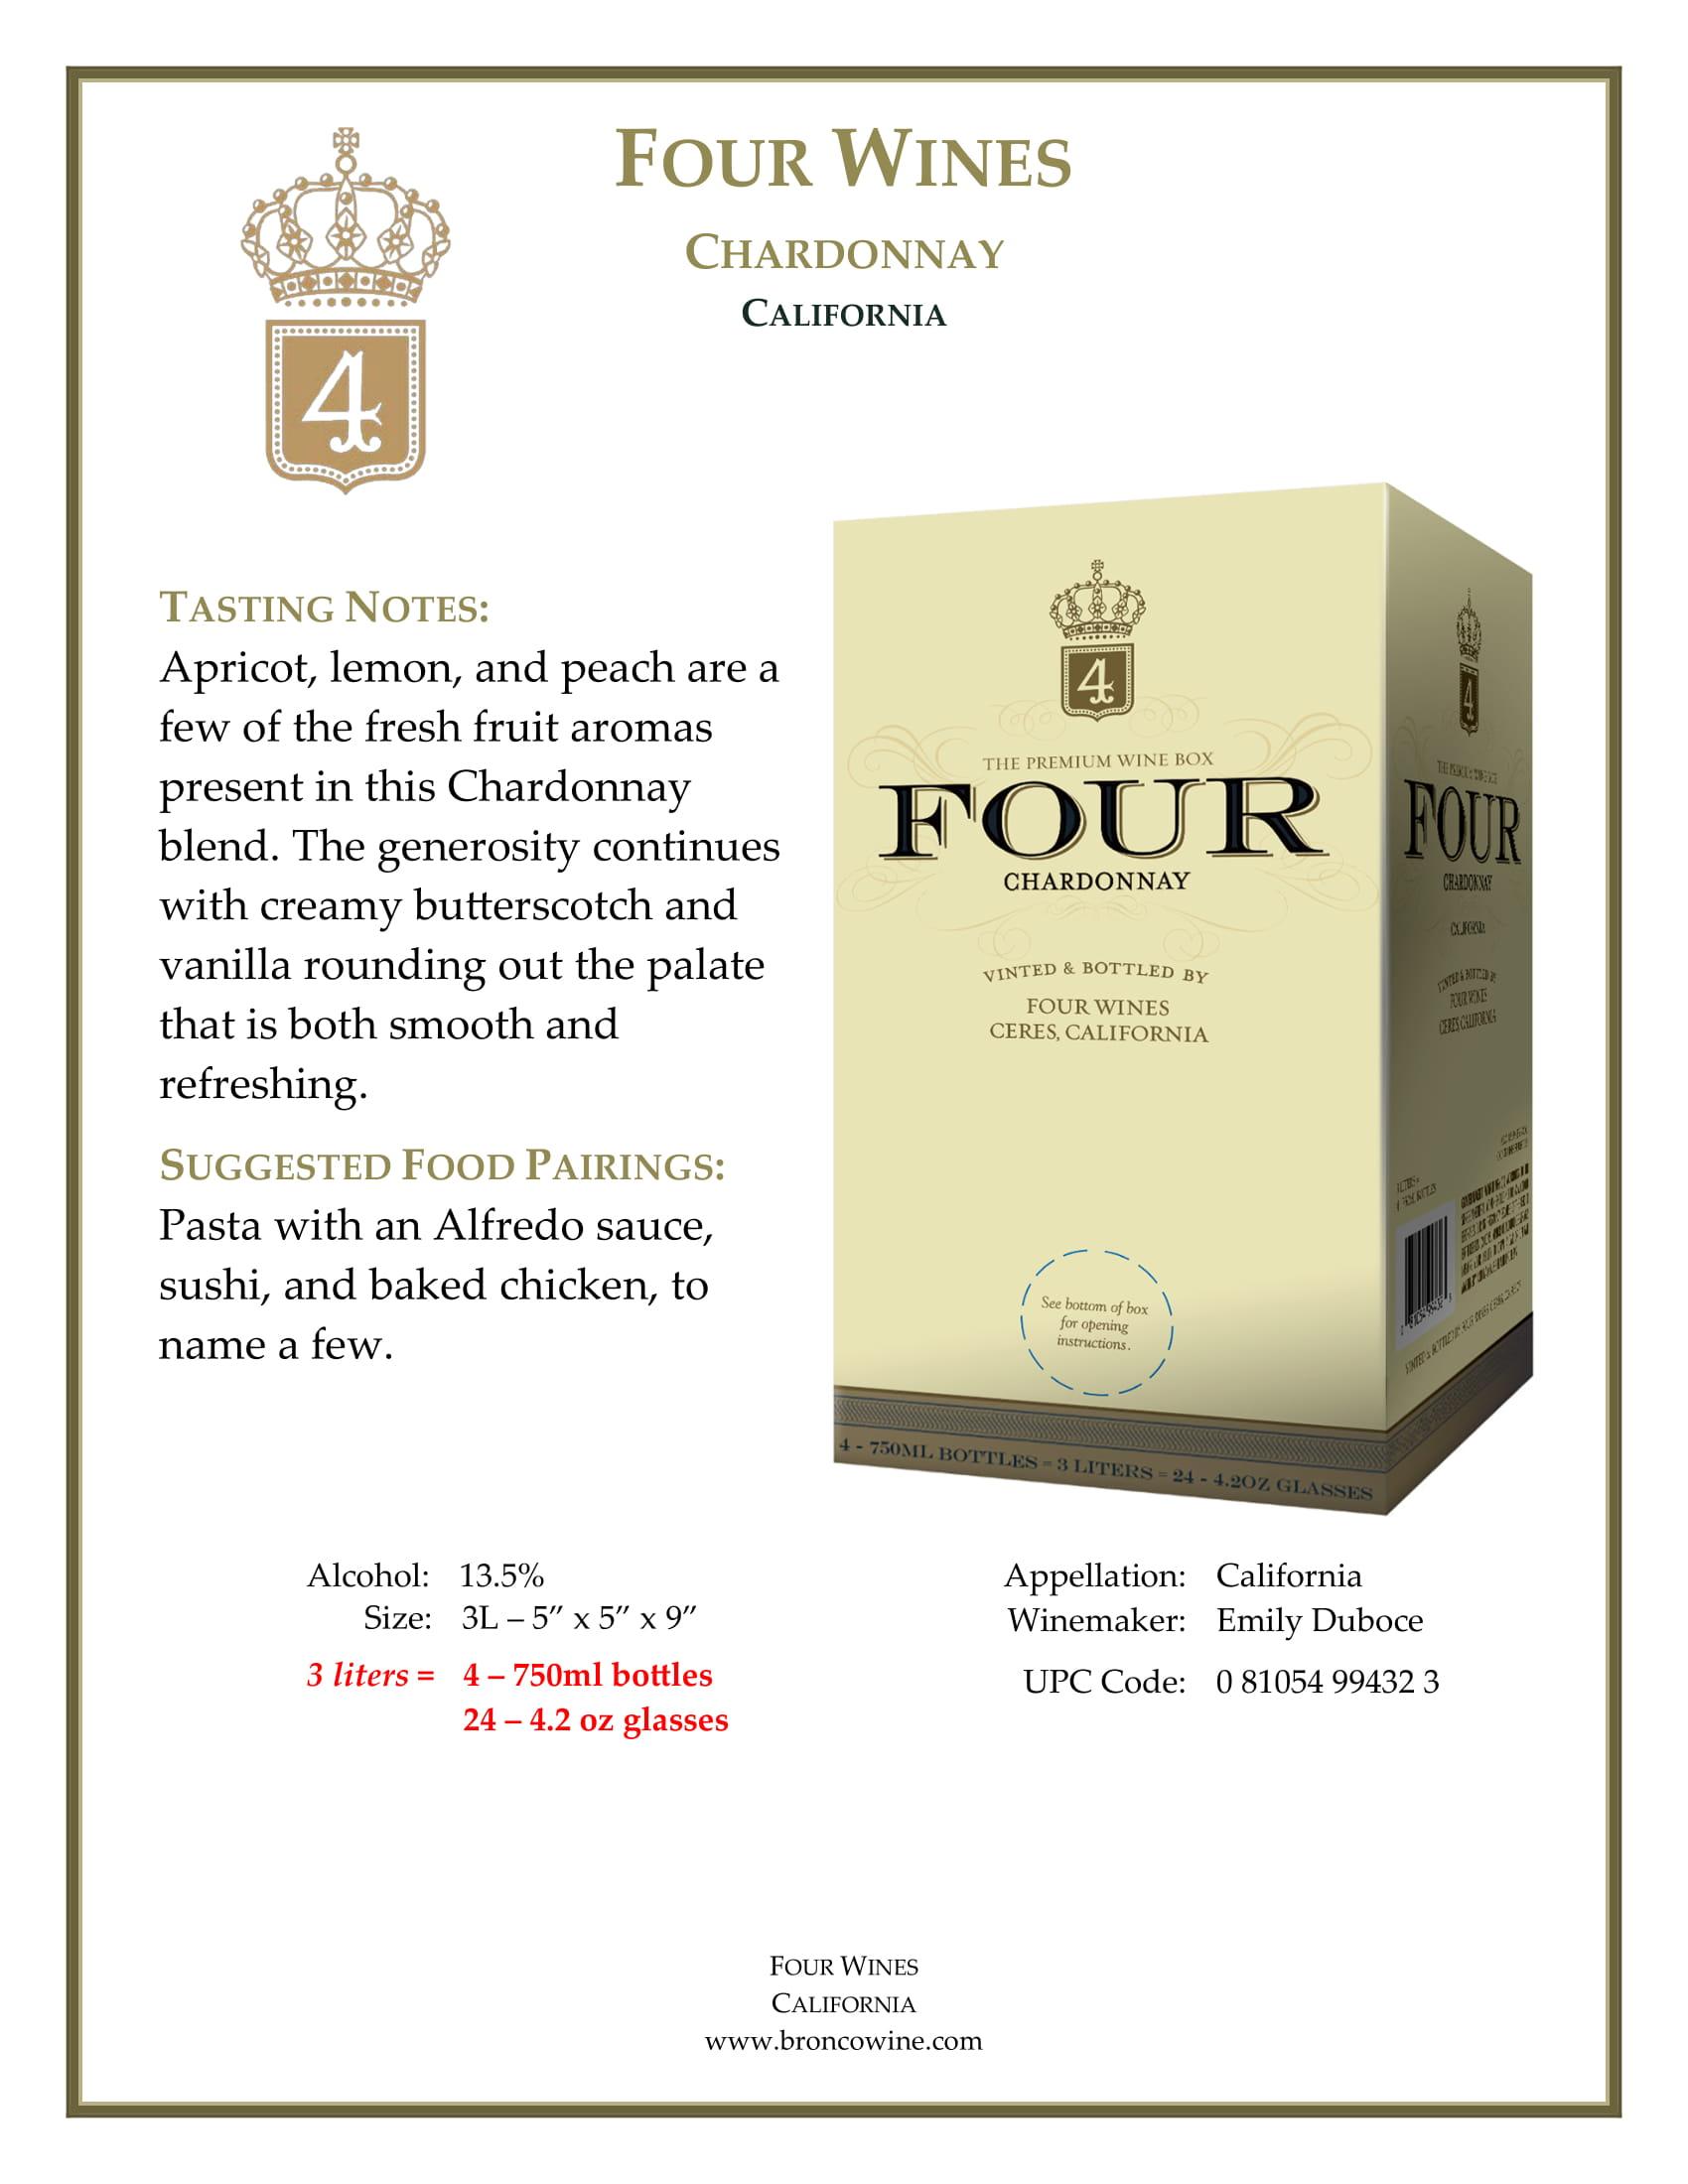 Four Wines Chardonnay Box Tech Sheet